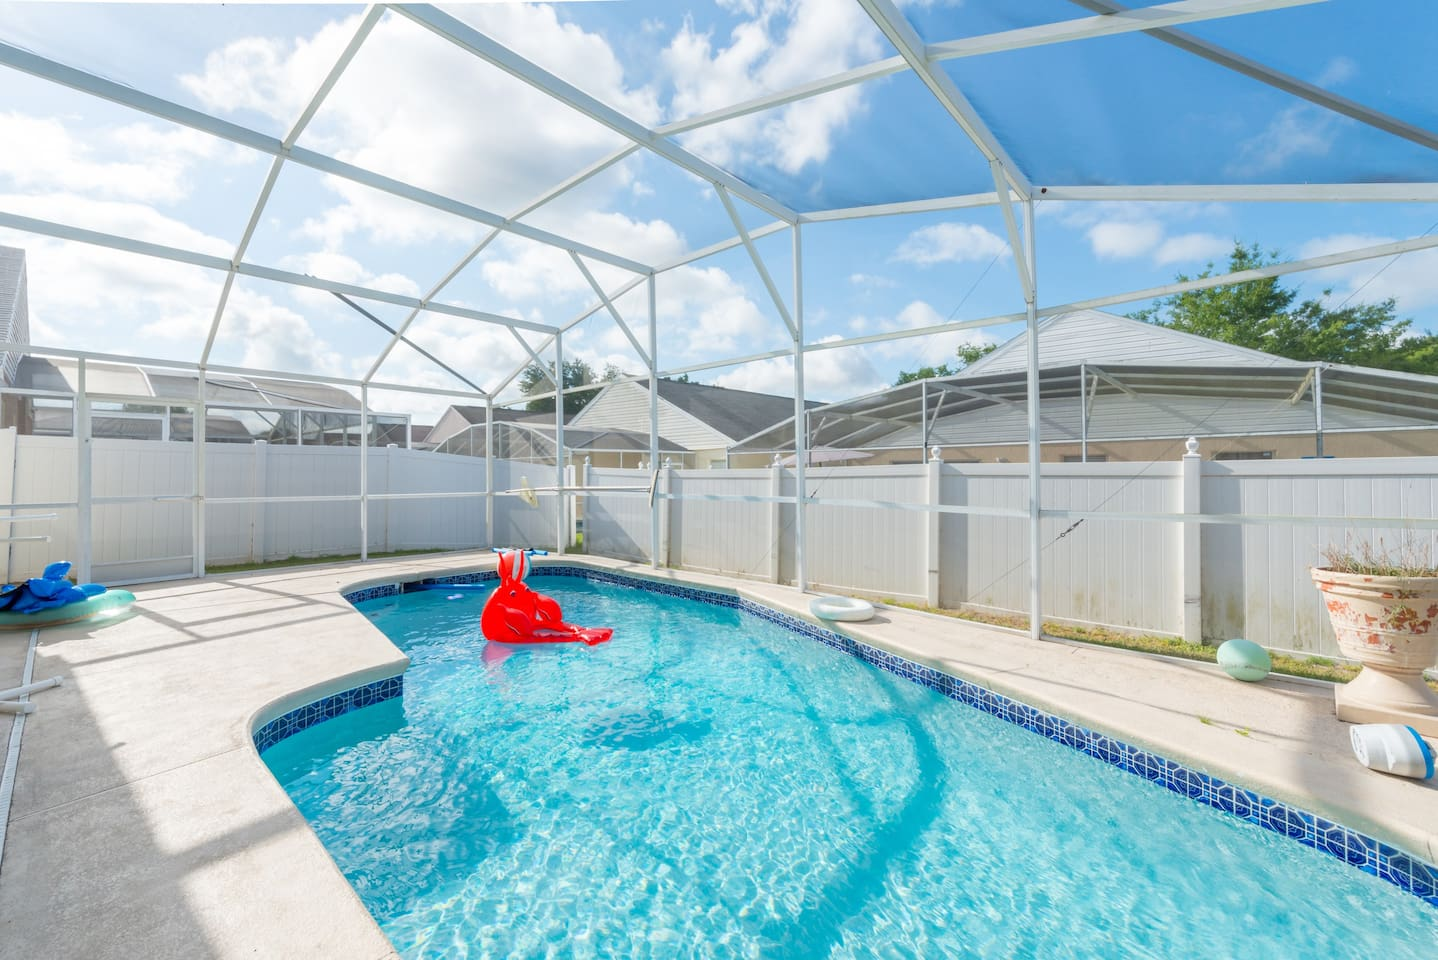 Apartment Spacious 3BR Home   King Bed  Near Disney w  Pool  photo 16704285